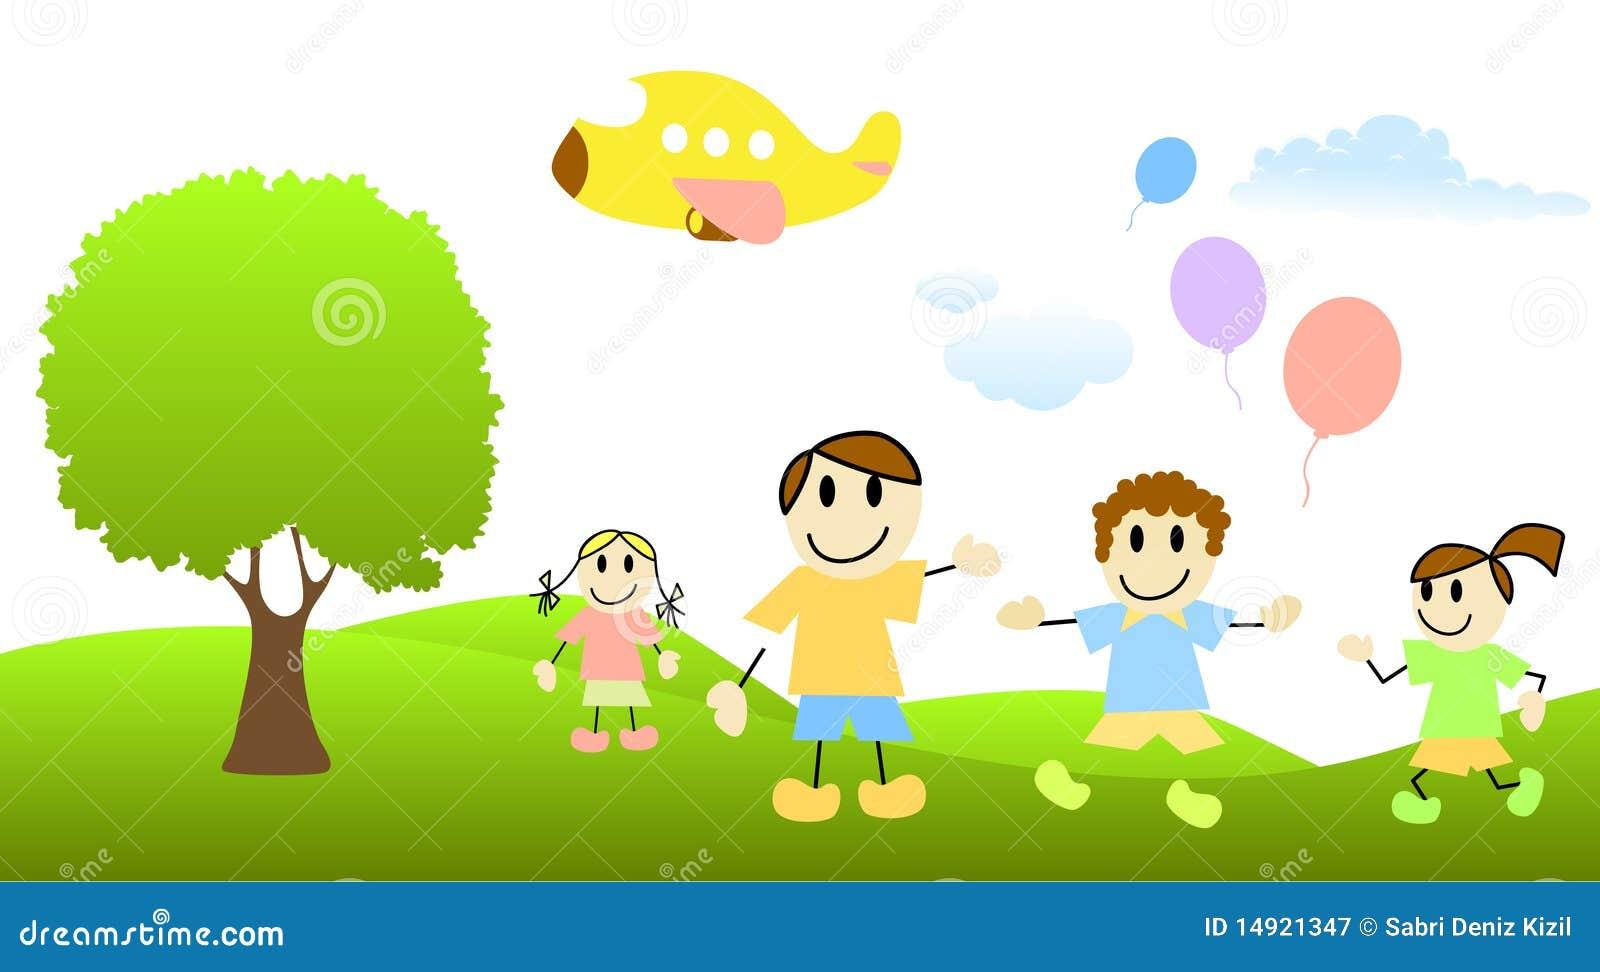 cartoon - Free Download Cartoon For Children